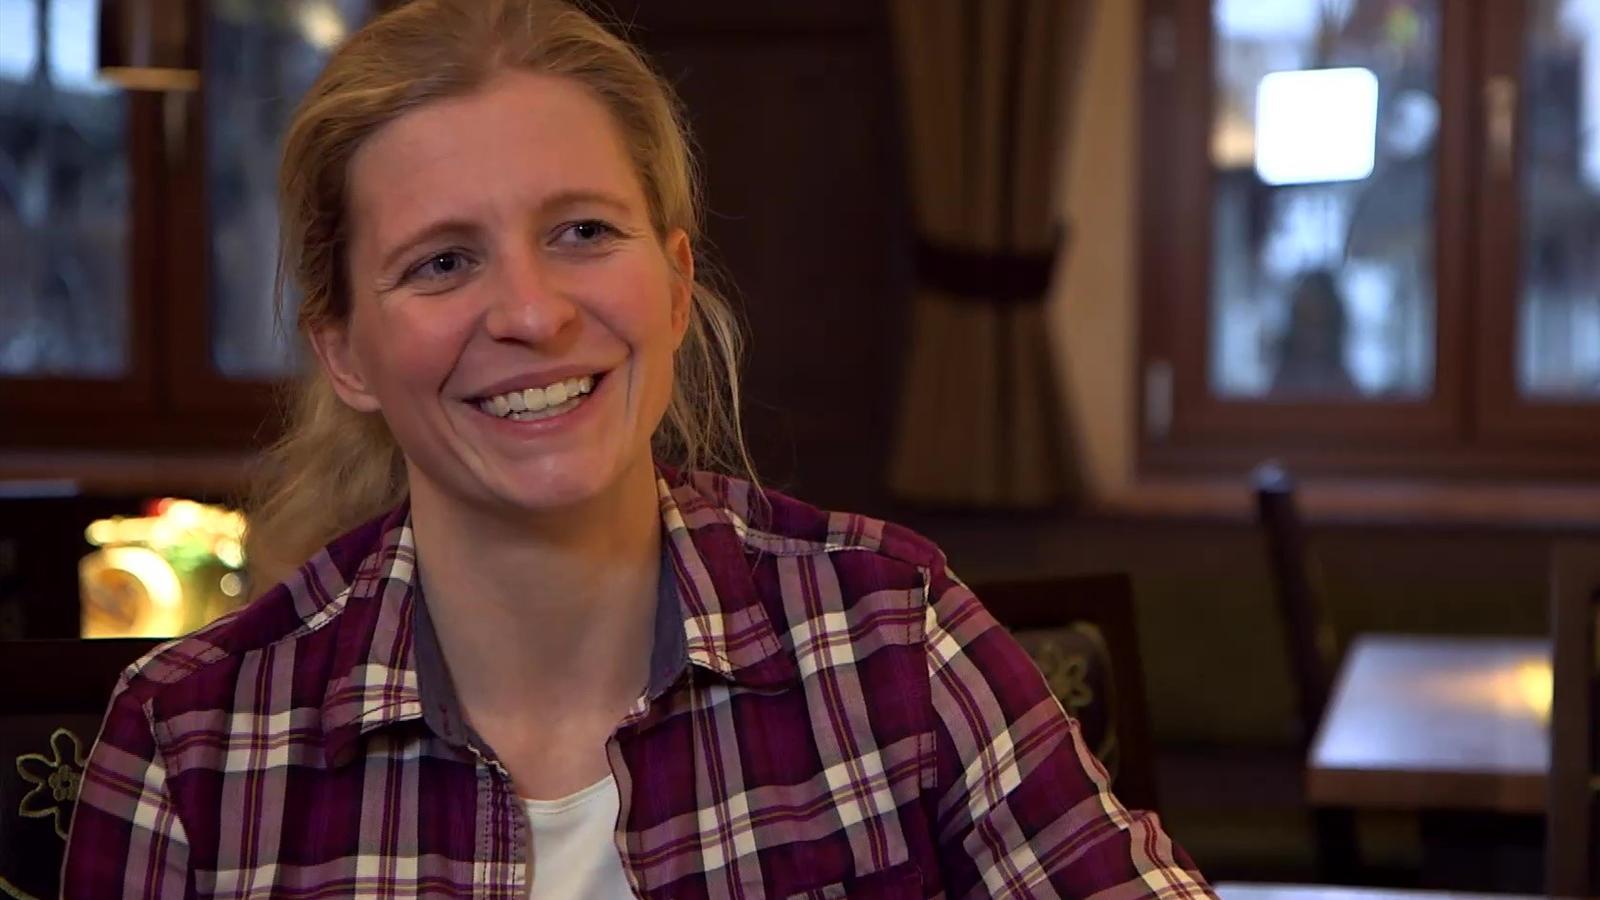 Video athlete stories franziska hildebrand video - University league tables french ...